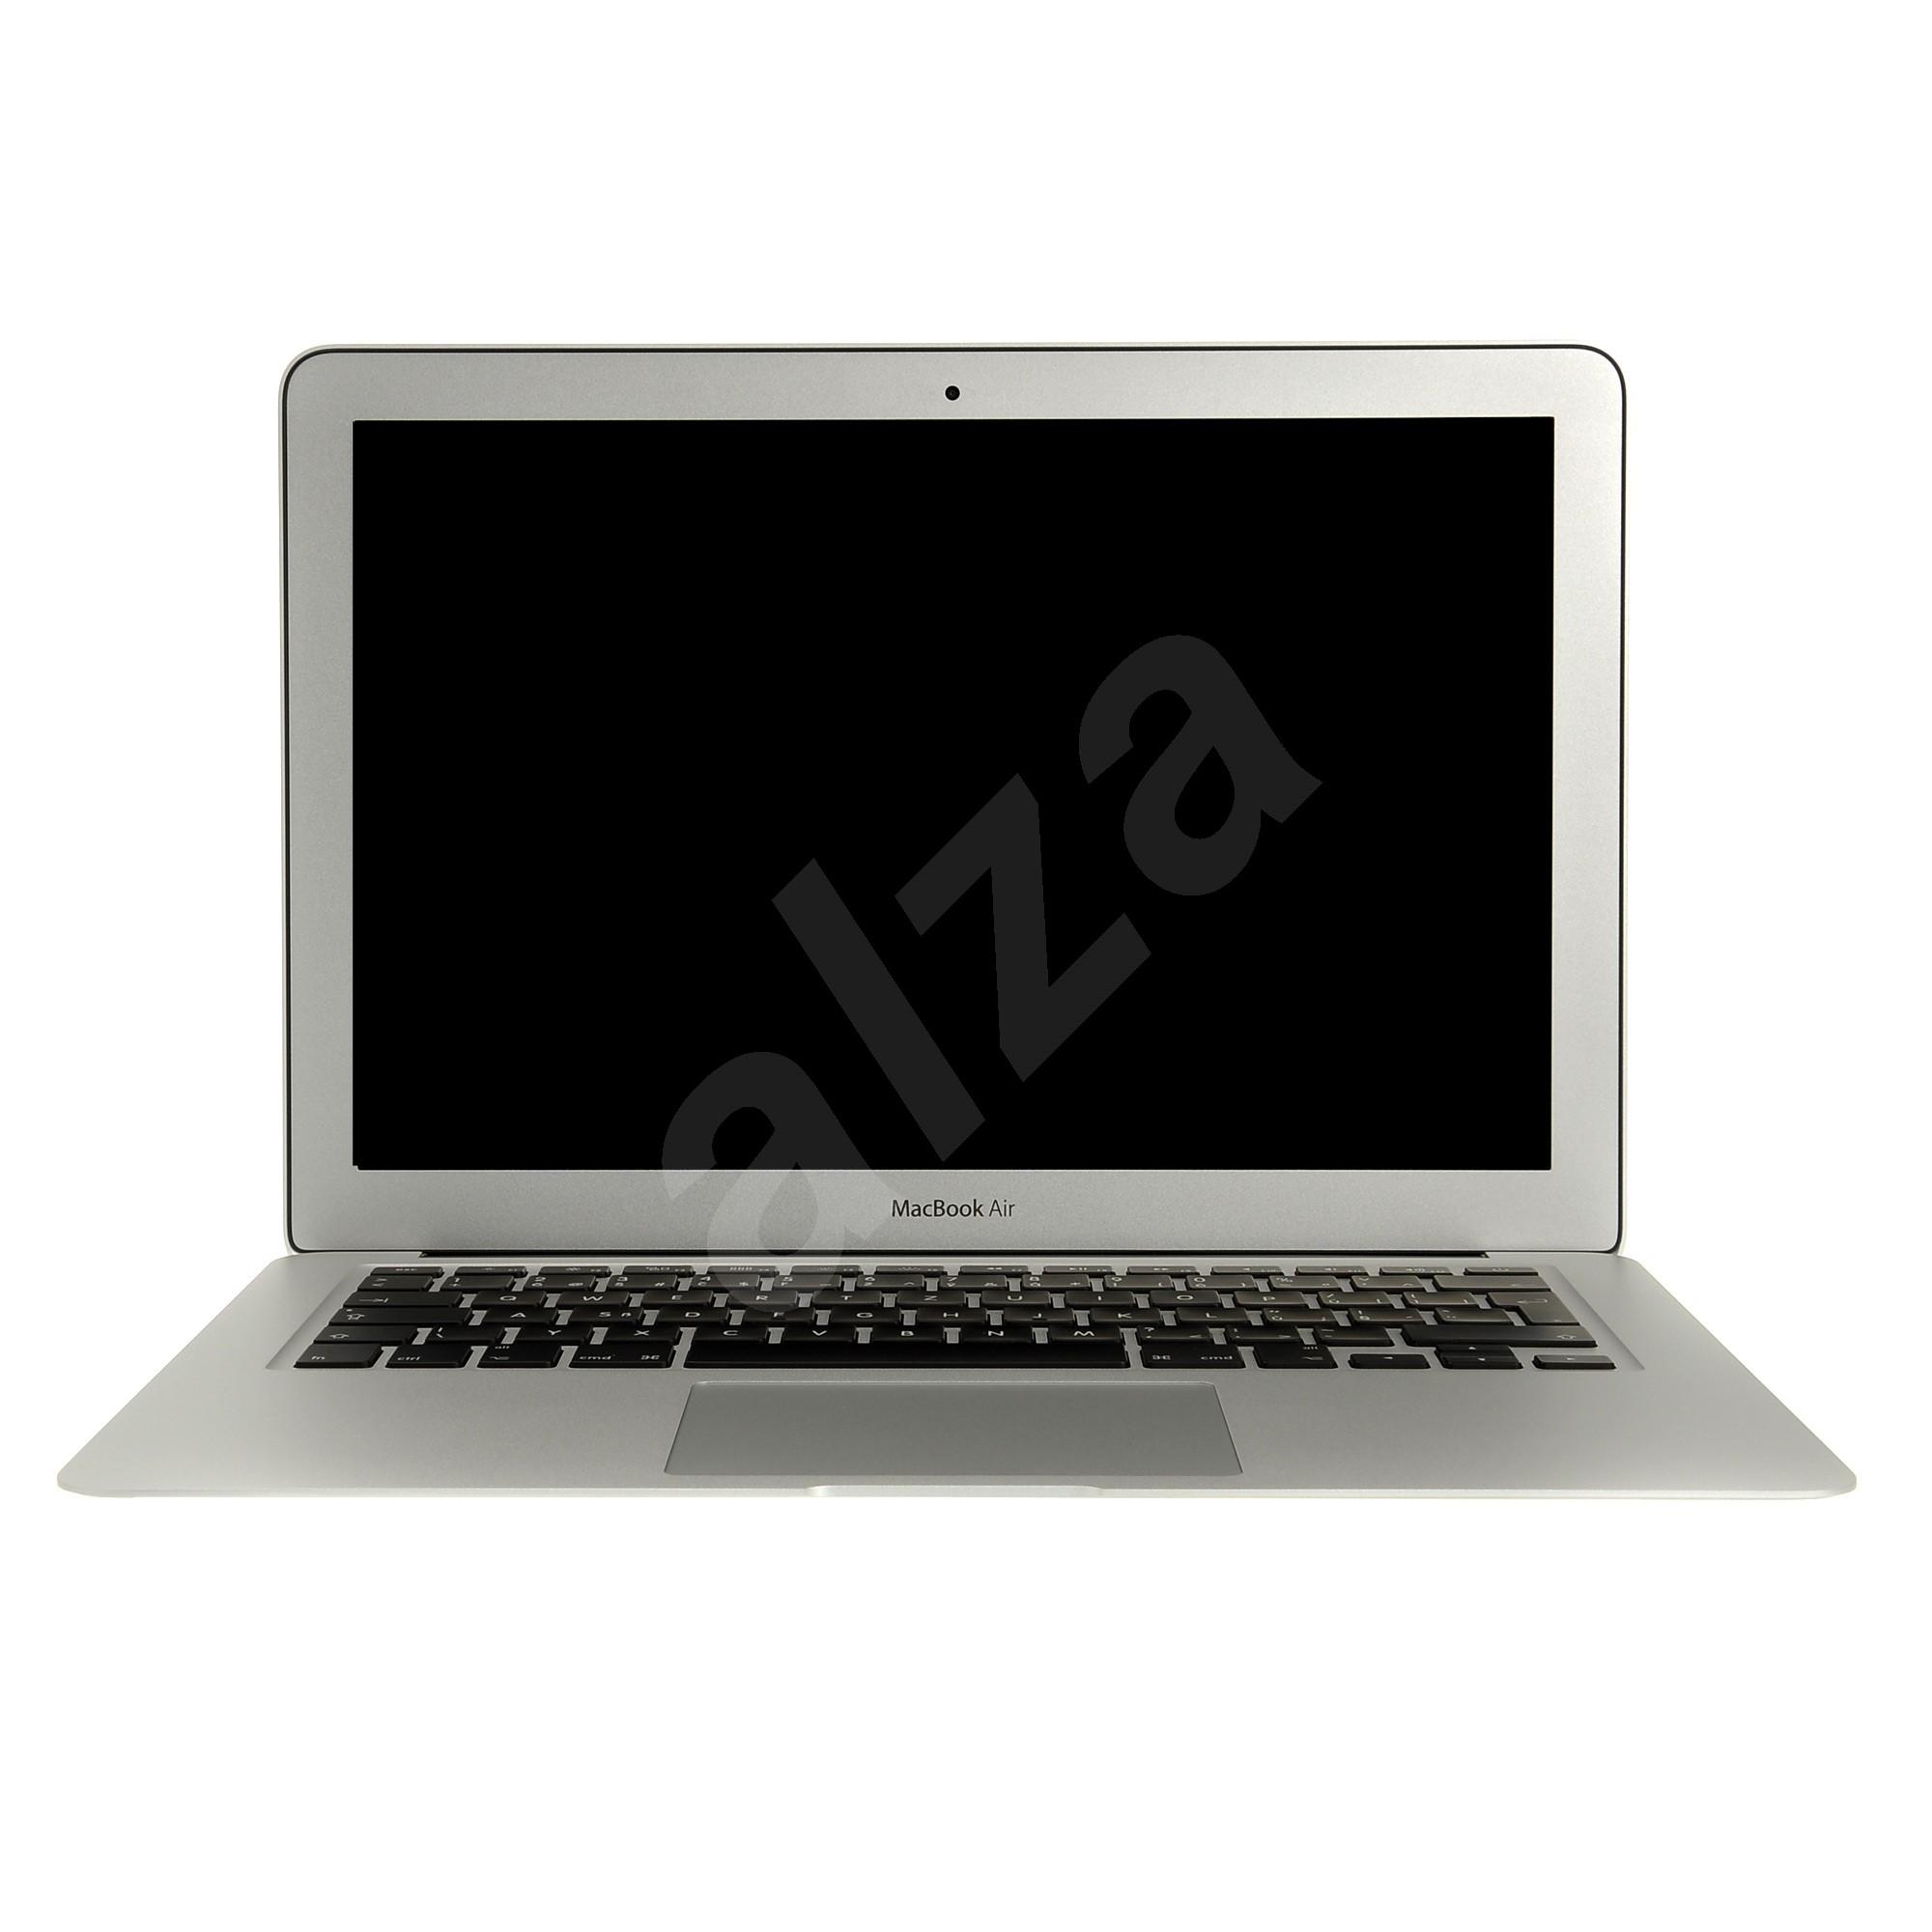 macbook air 13 cz notebook. Black Bedroom Furniture Sets. Home Design Ideas